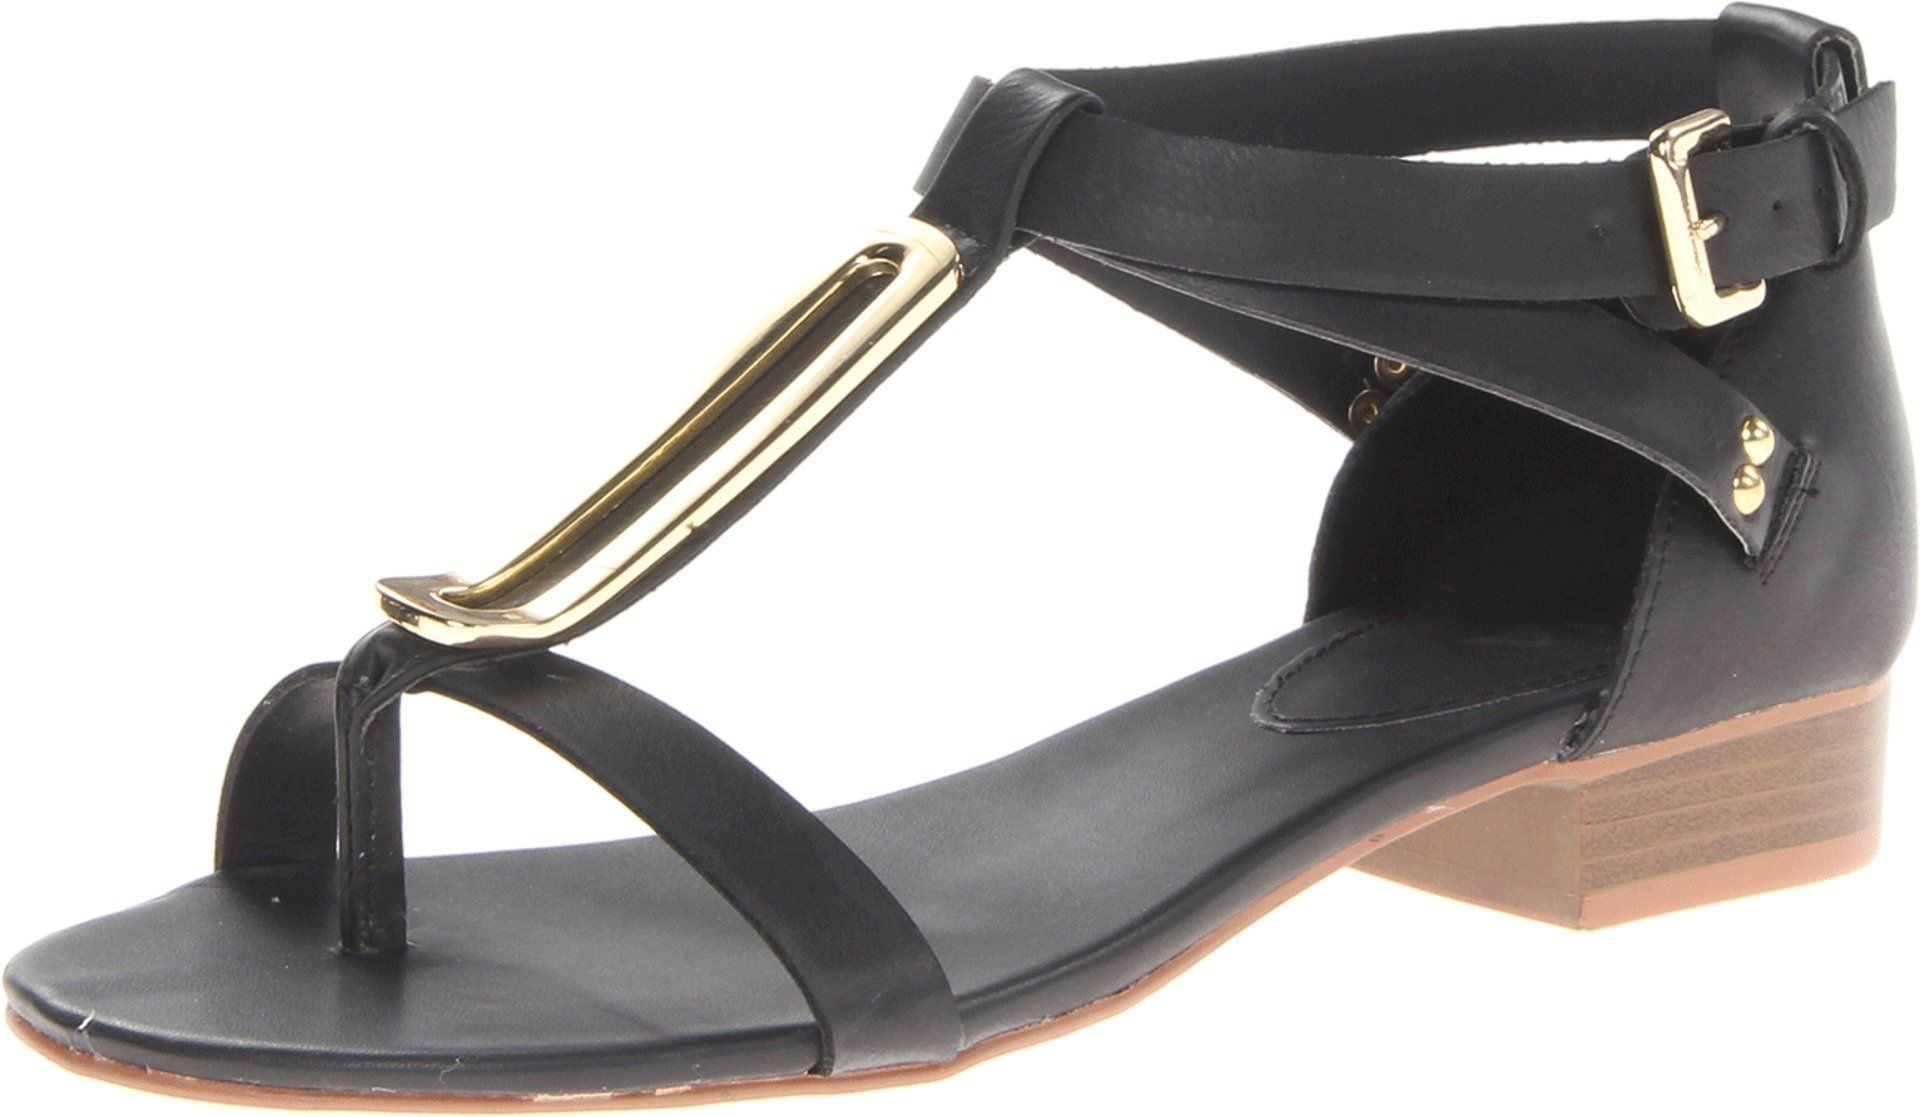 Mia Women S Cairo Dress Sandal Black Vegan 8 5 M Us Womens Sandals Flat Dress Sandals Womens Sandals [ 1117 x 1920 Pixel ]